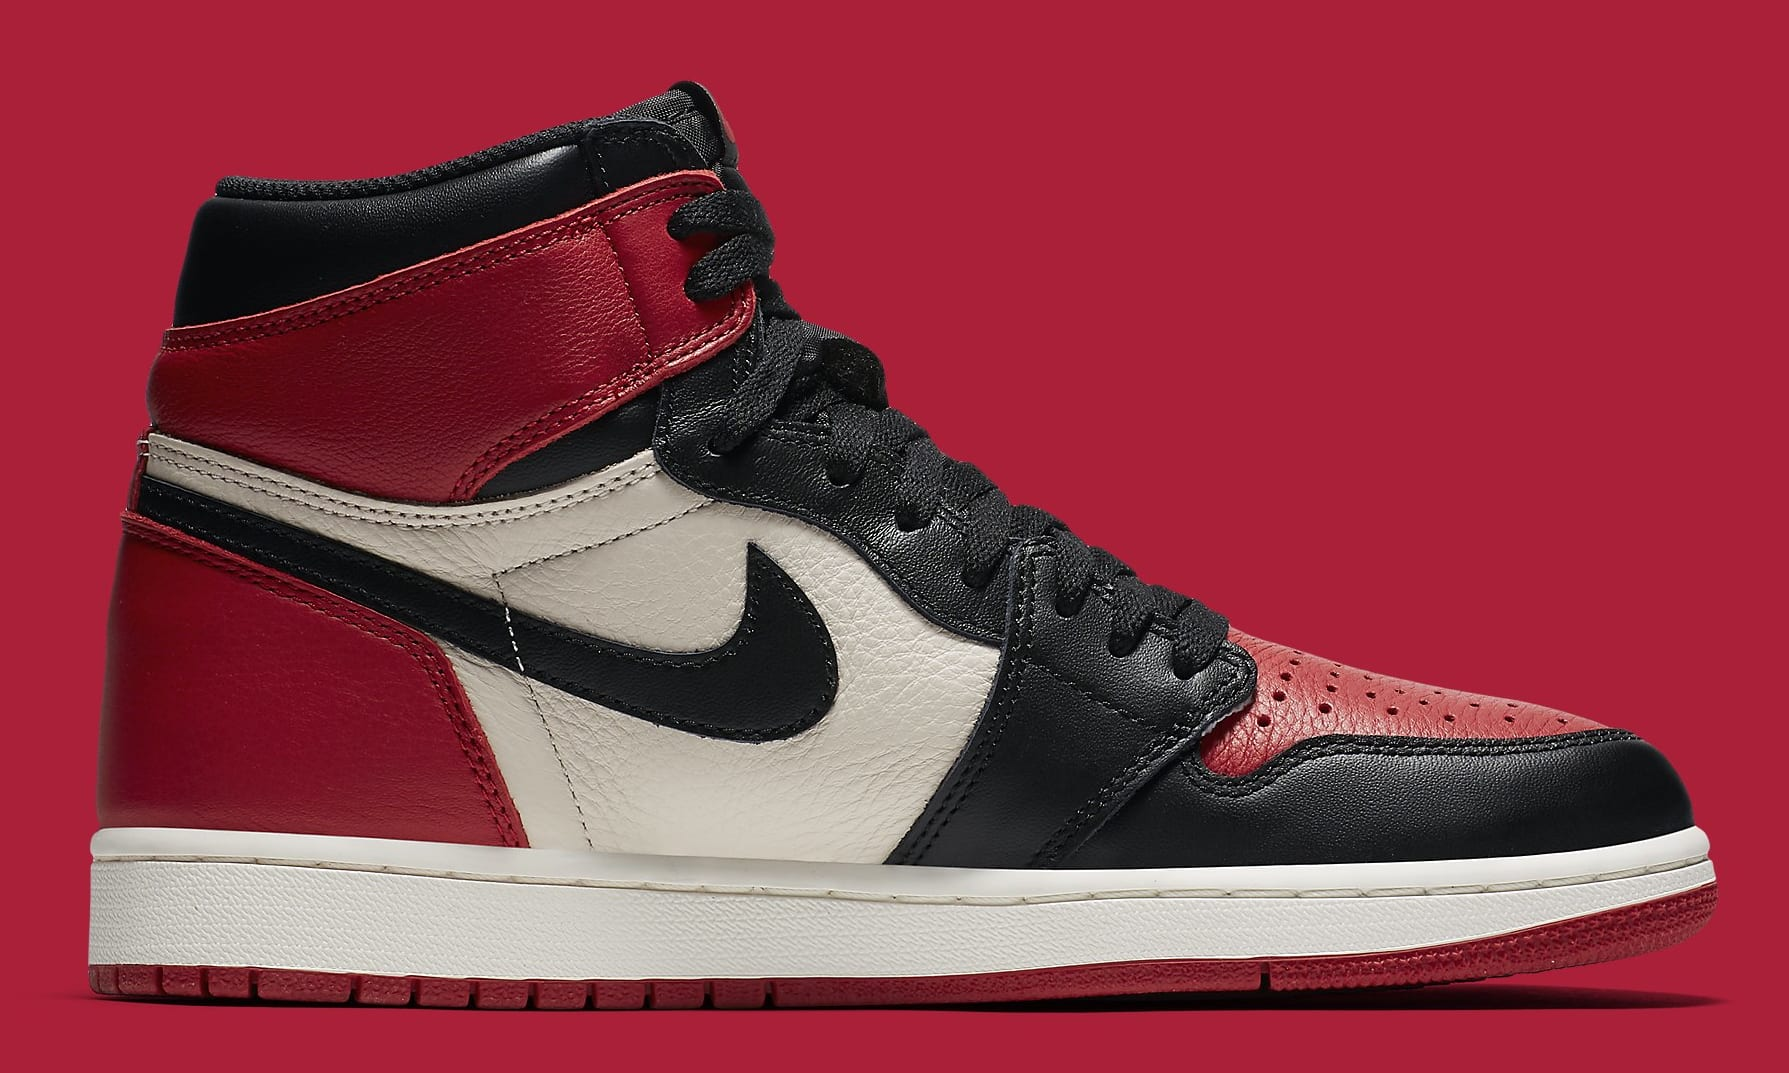 613143c782ba ... release cb1ad 446d0 Image via Nike Air Jordan 1 Bred Toe Gym RedBlack  ...